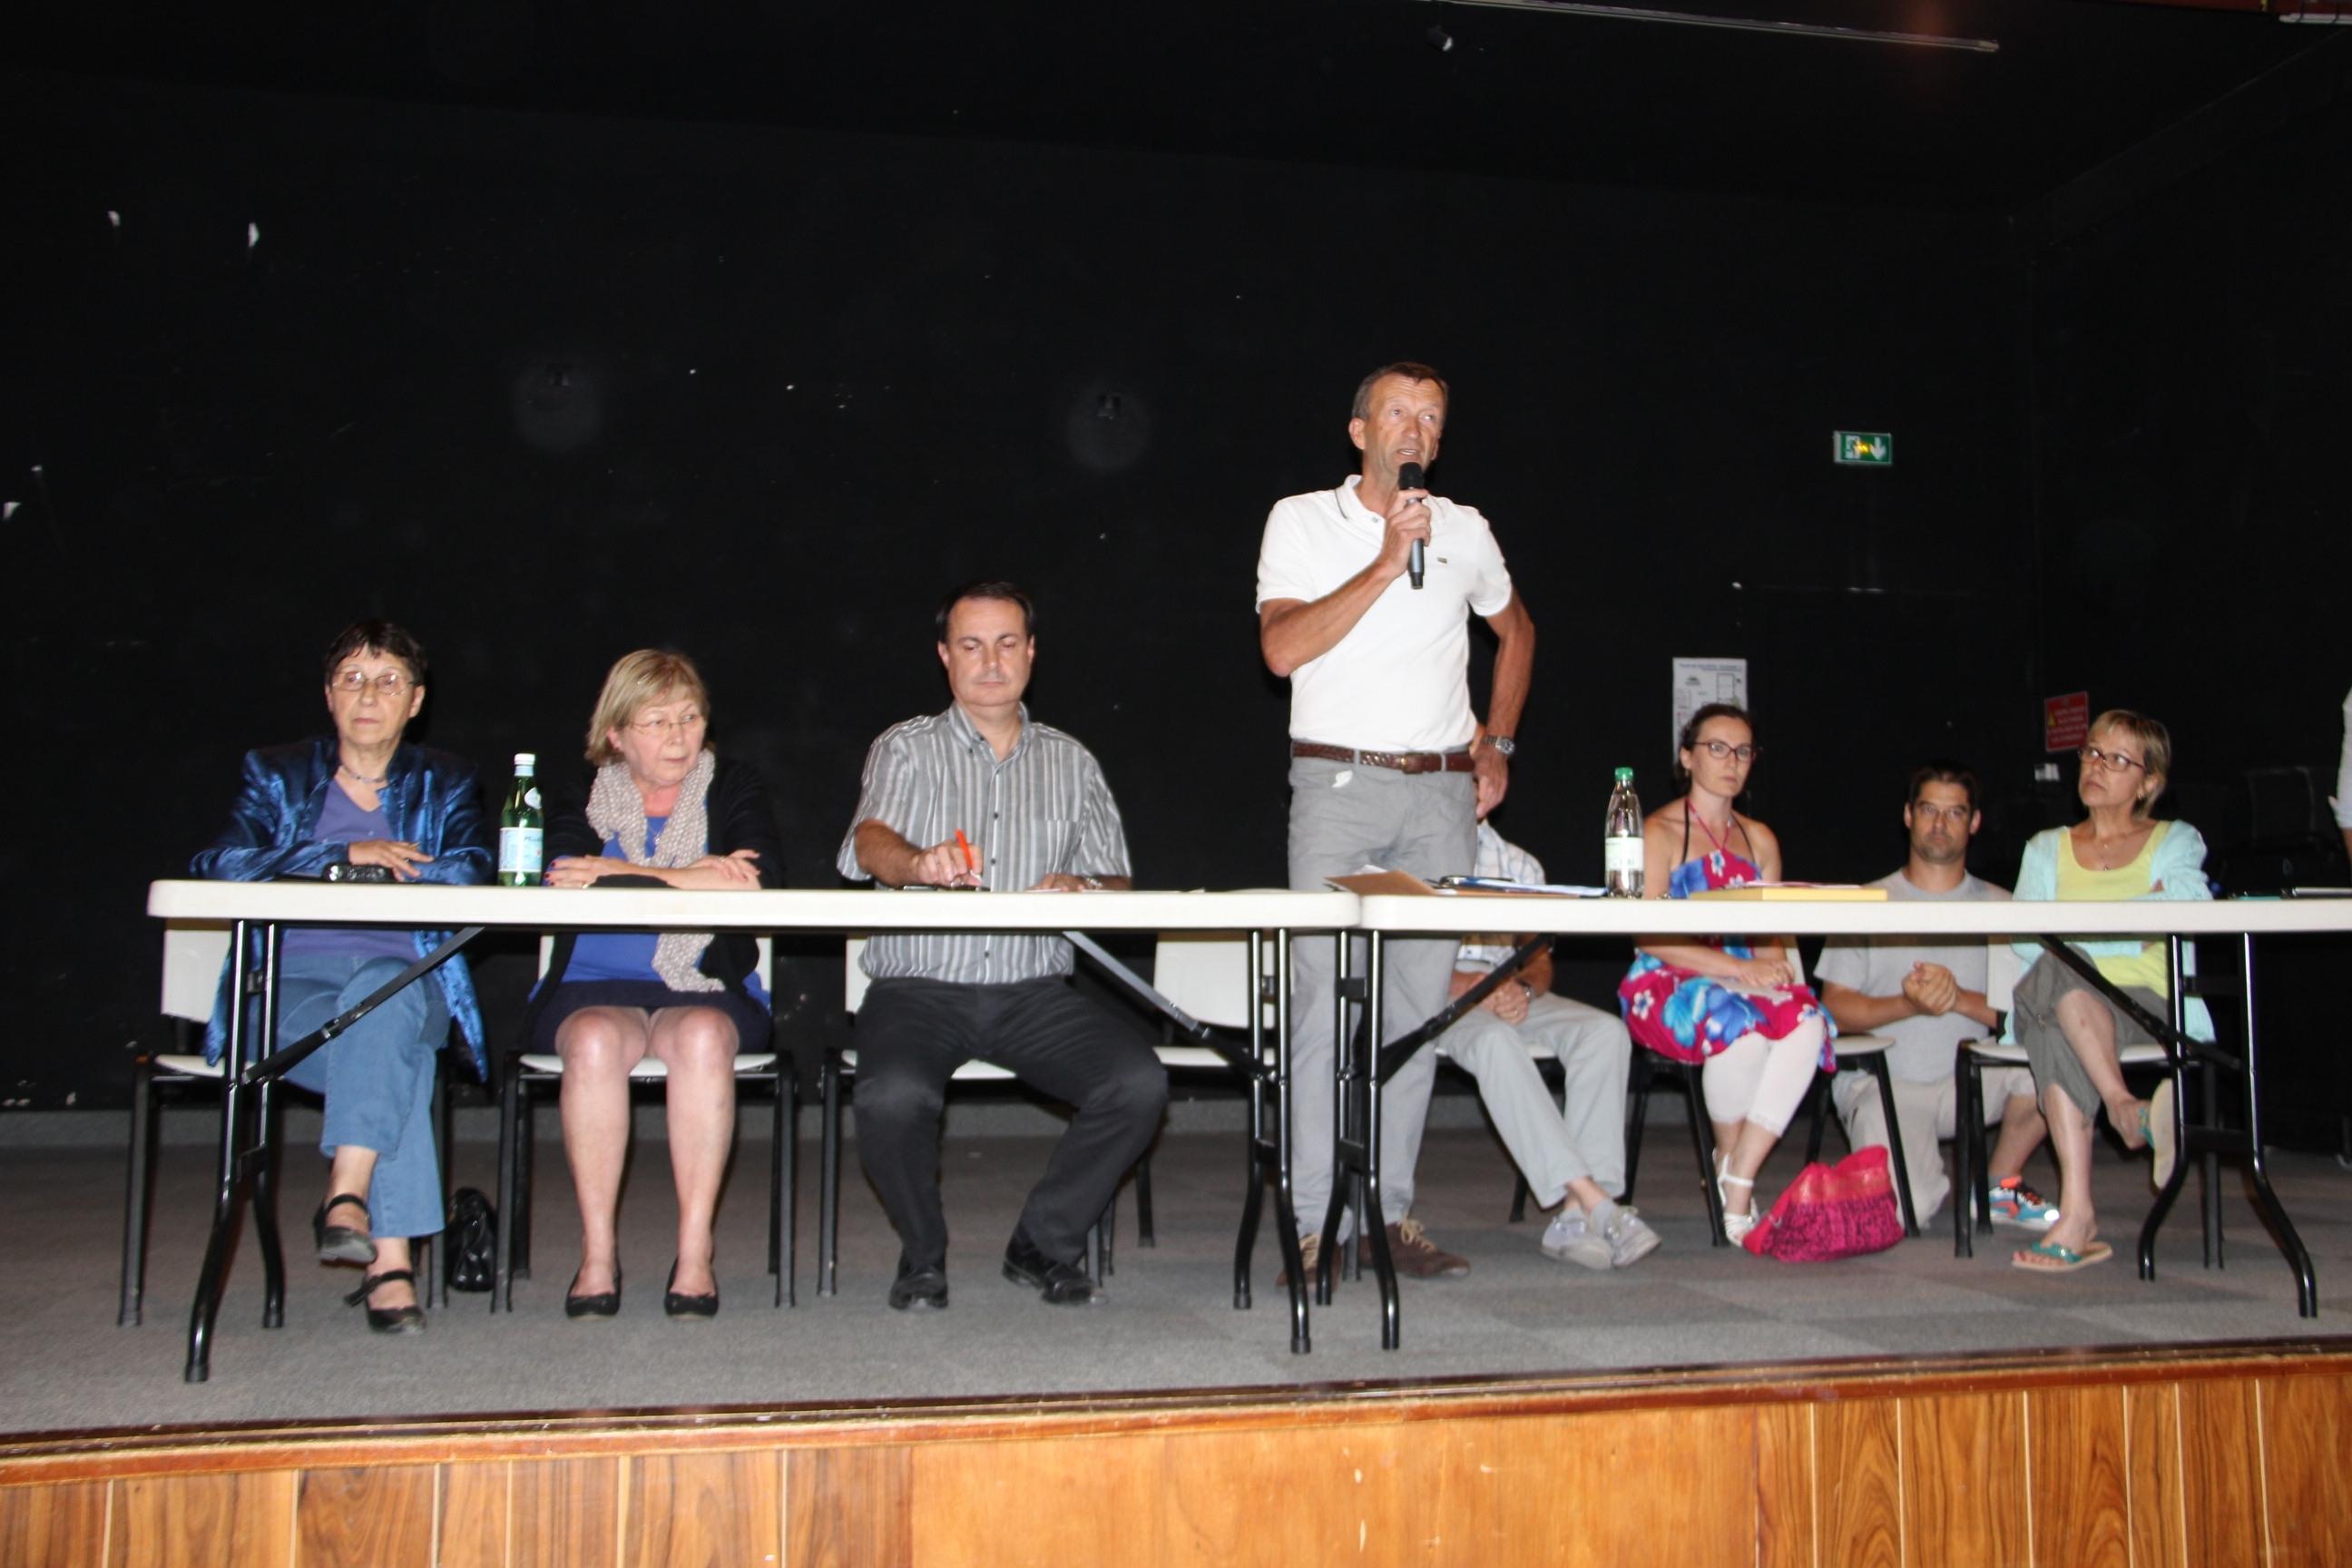 reunion 23 juin tribune debout